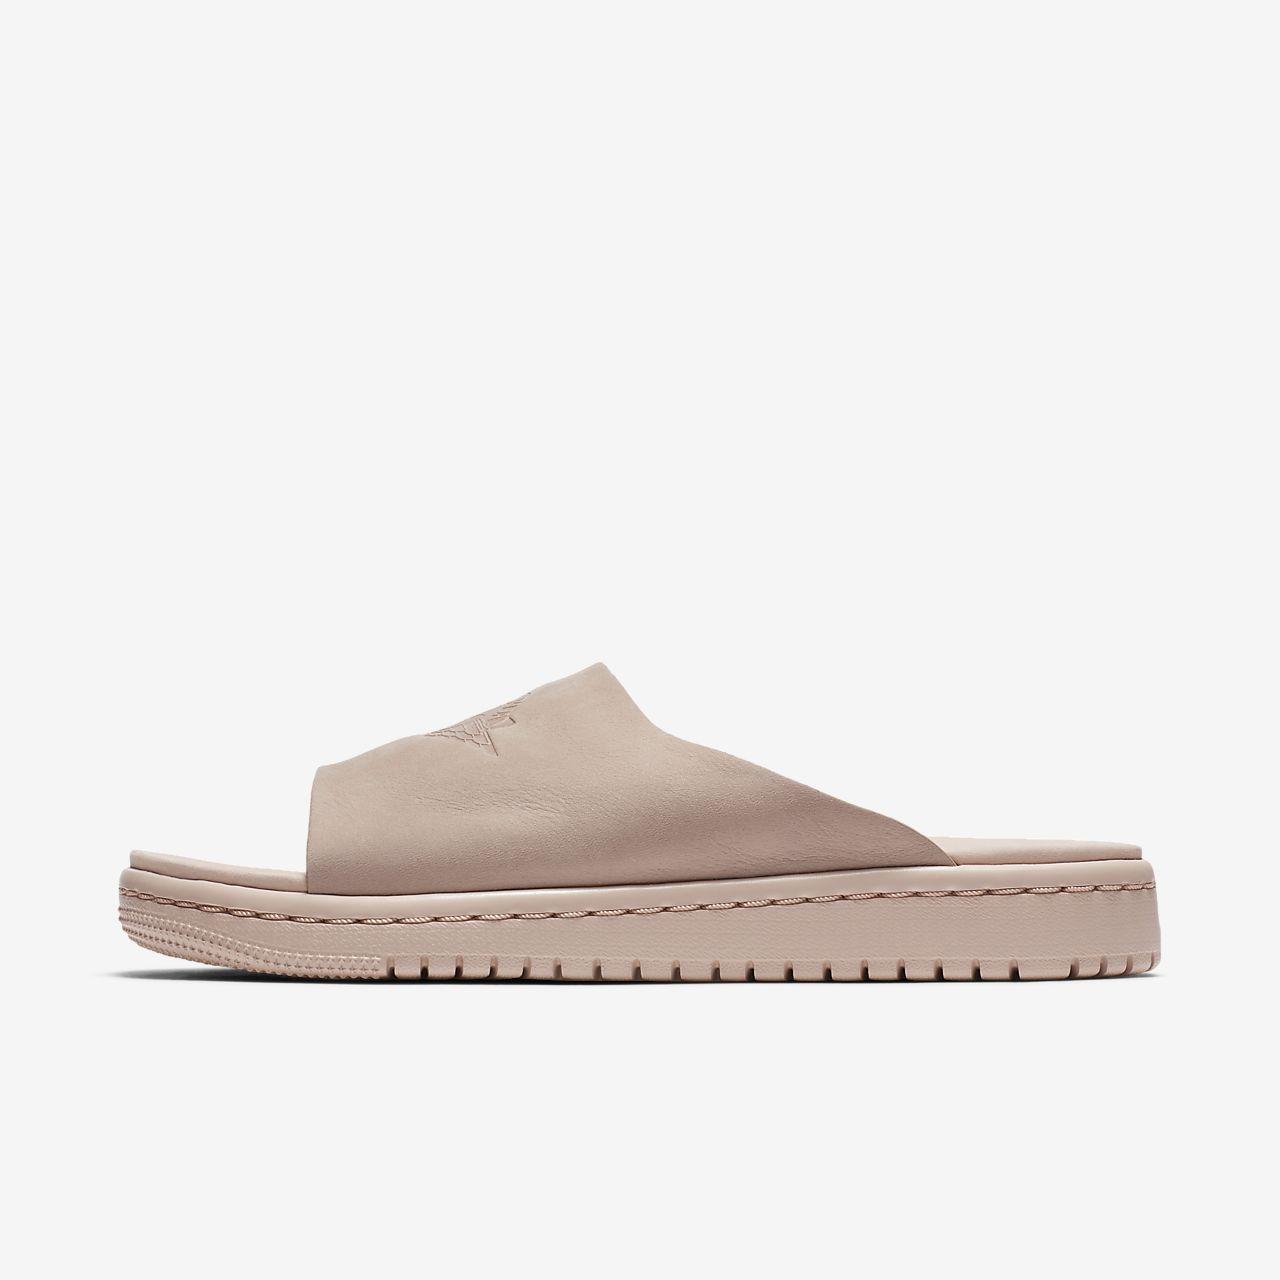 Nike Acg - Sandales Femmes, Marron, Taille 38